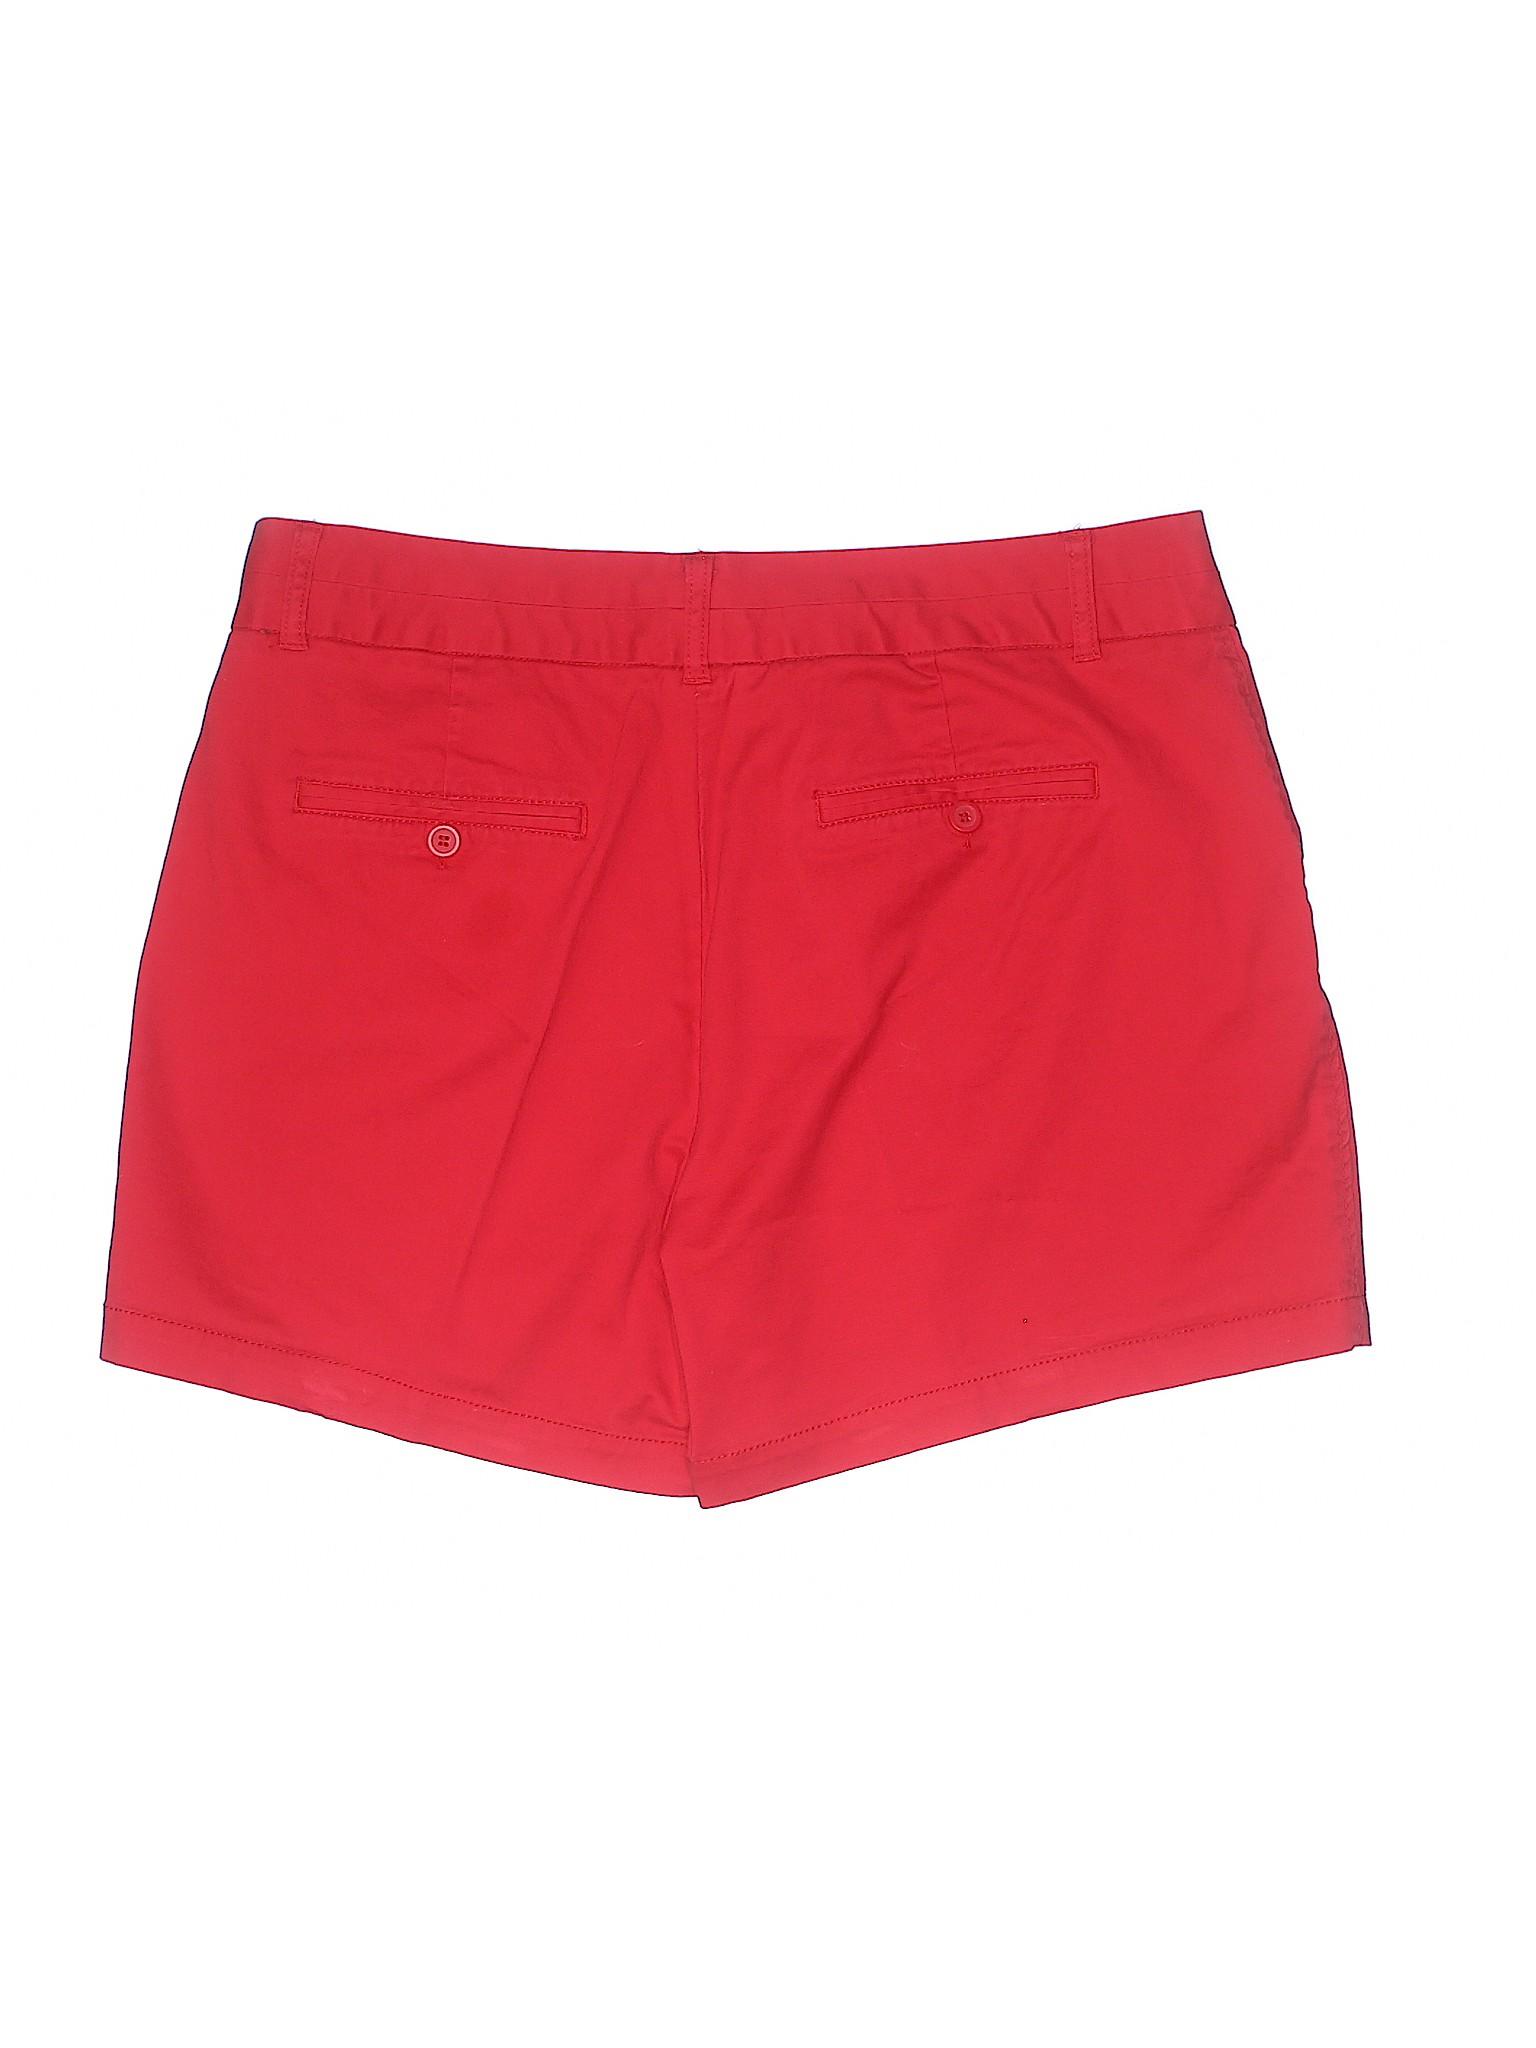 Ali Khaki Roz Shorts amp; Boutique p8EqS